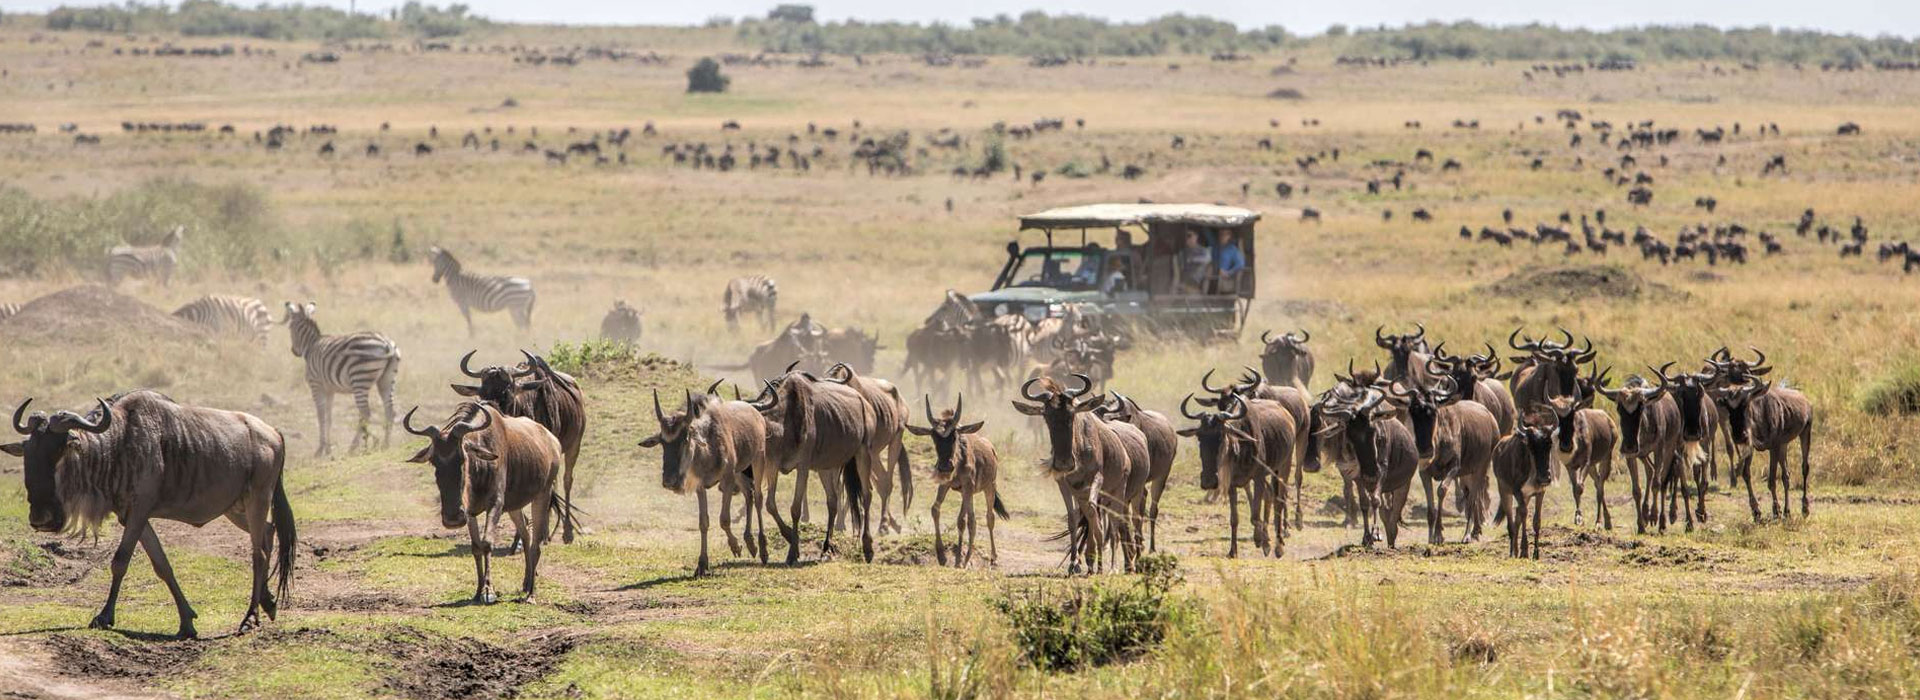 4 Days Masai Mara Wildebeest Migration Safari by Air from Mombasa